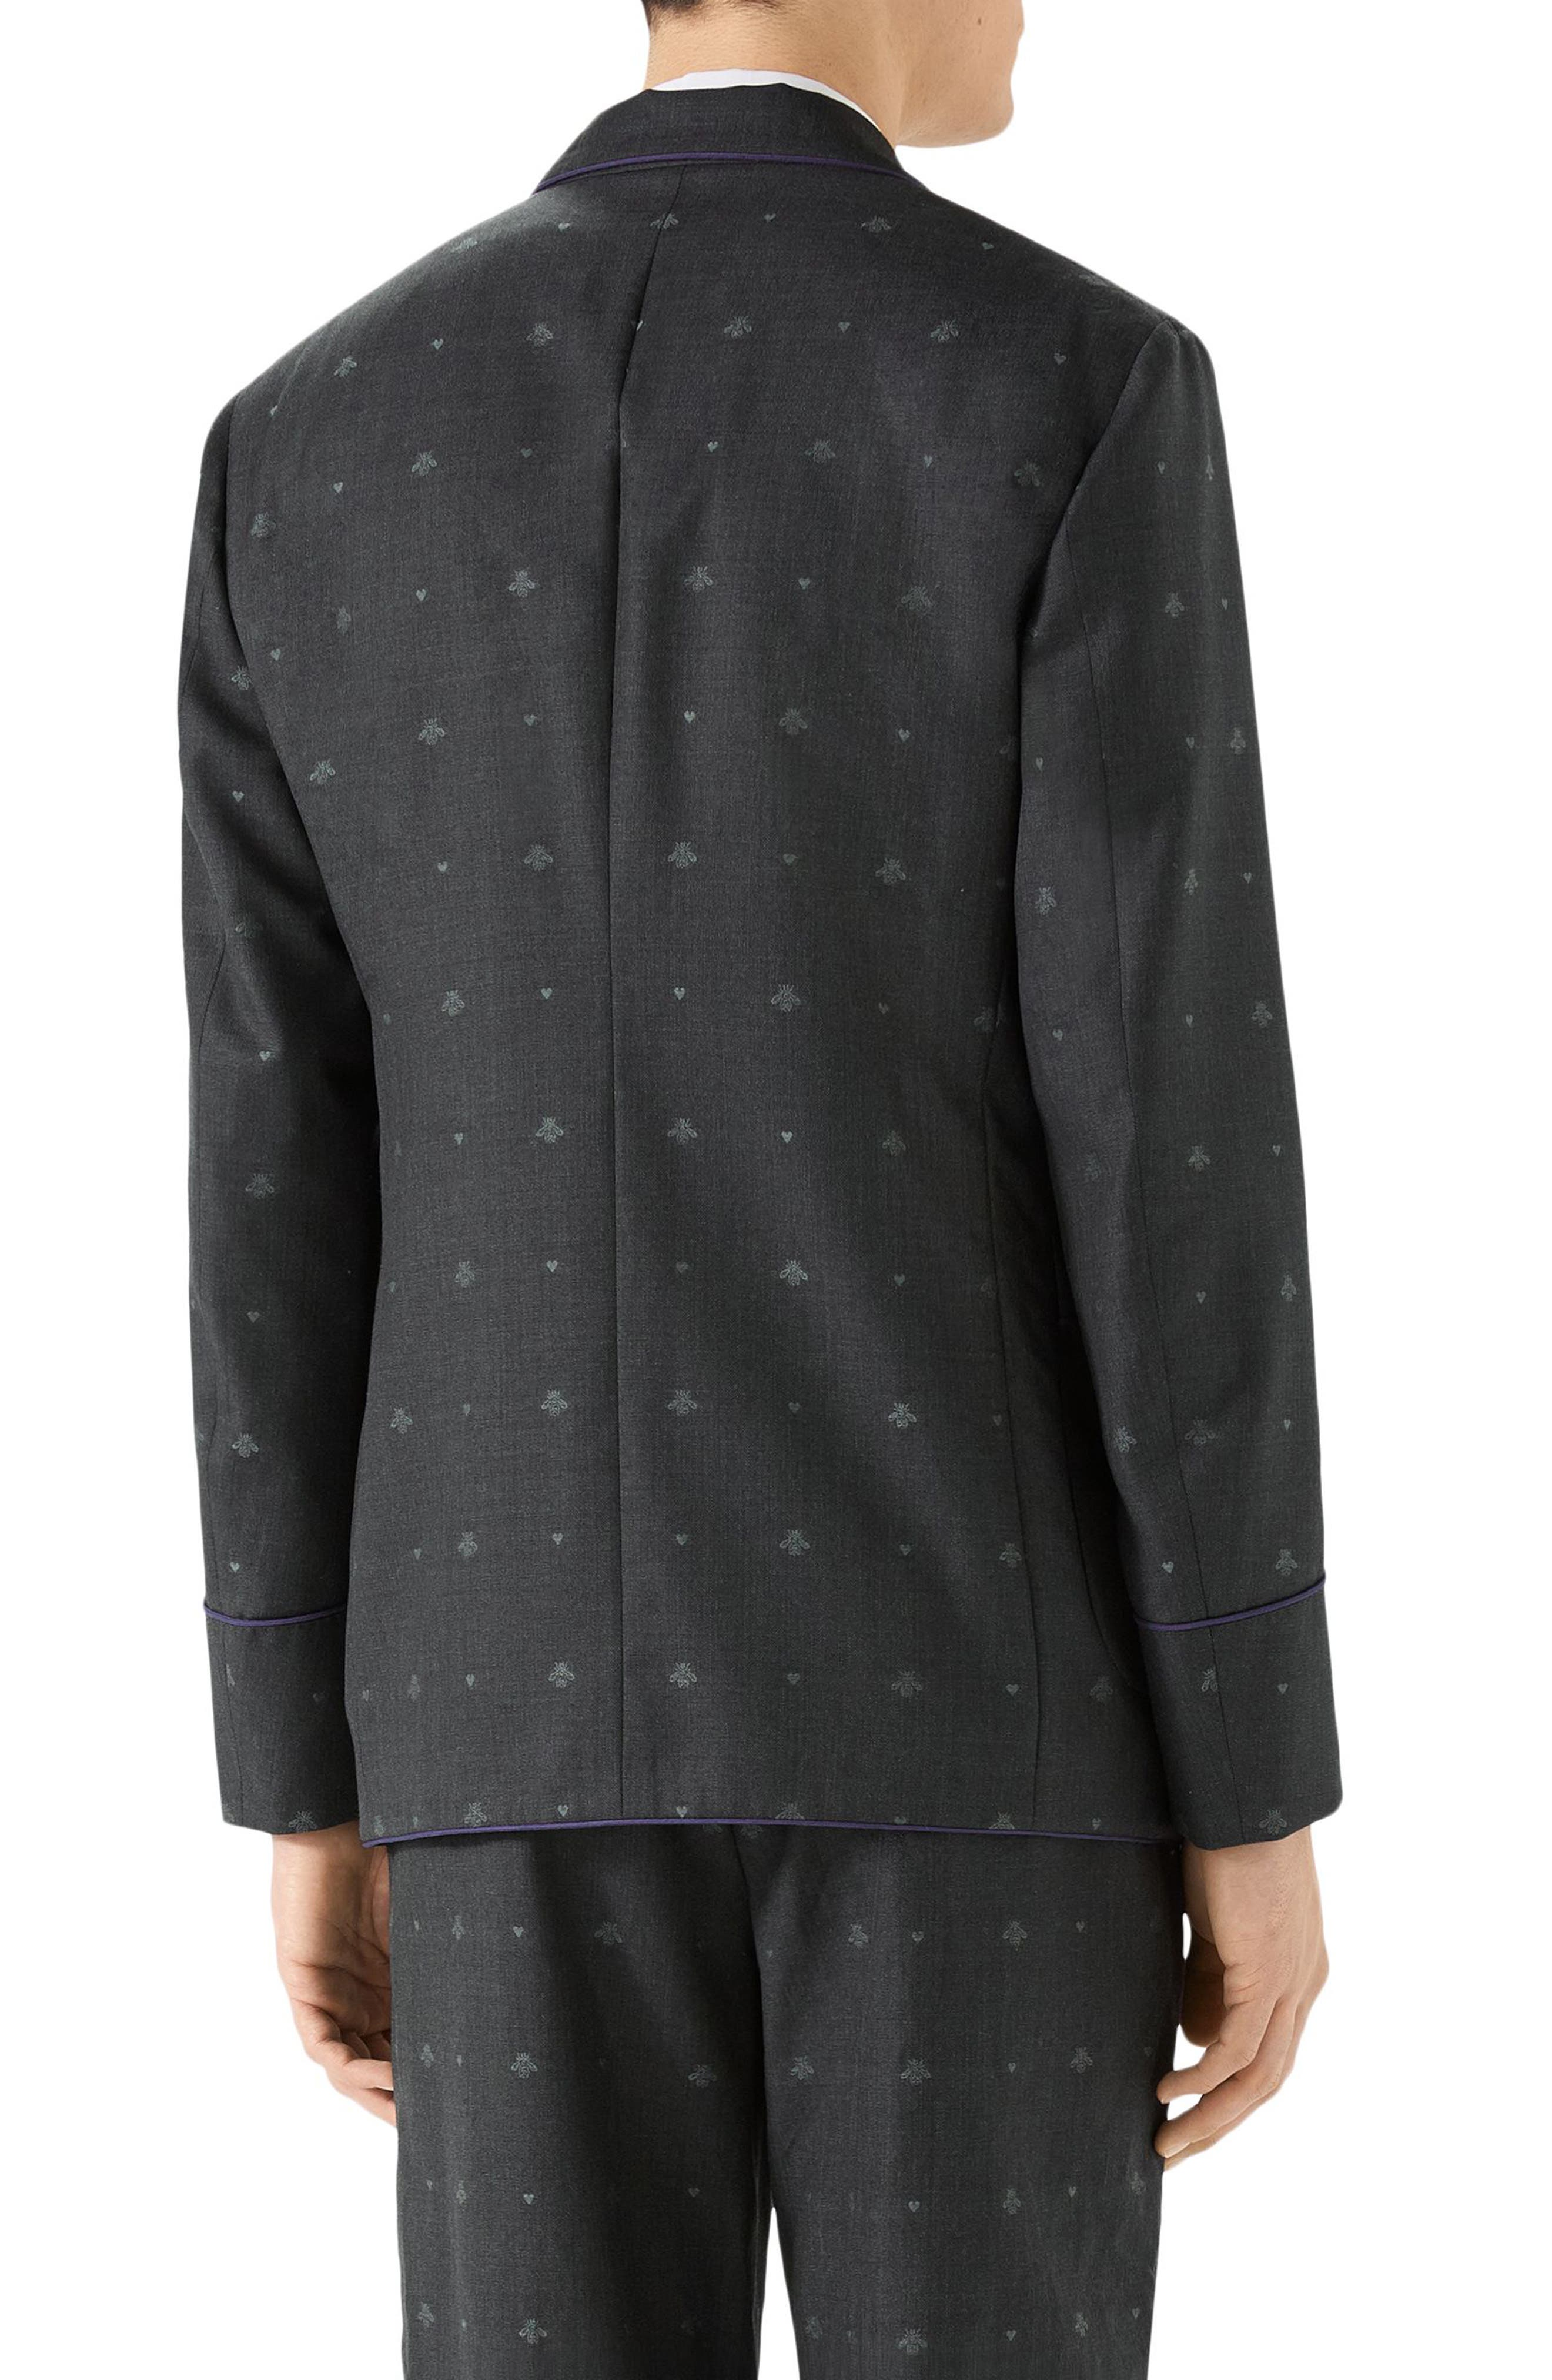 GUCCI,                             Bee & Heart Print Wool Sport Coat,                             Alternate thumbnail 2, color,                             DARK GREY